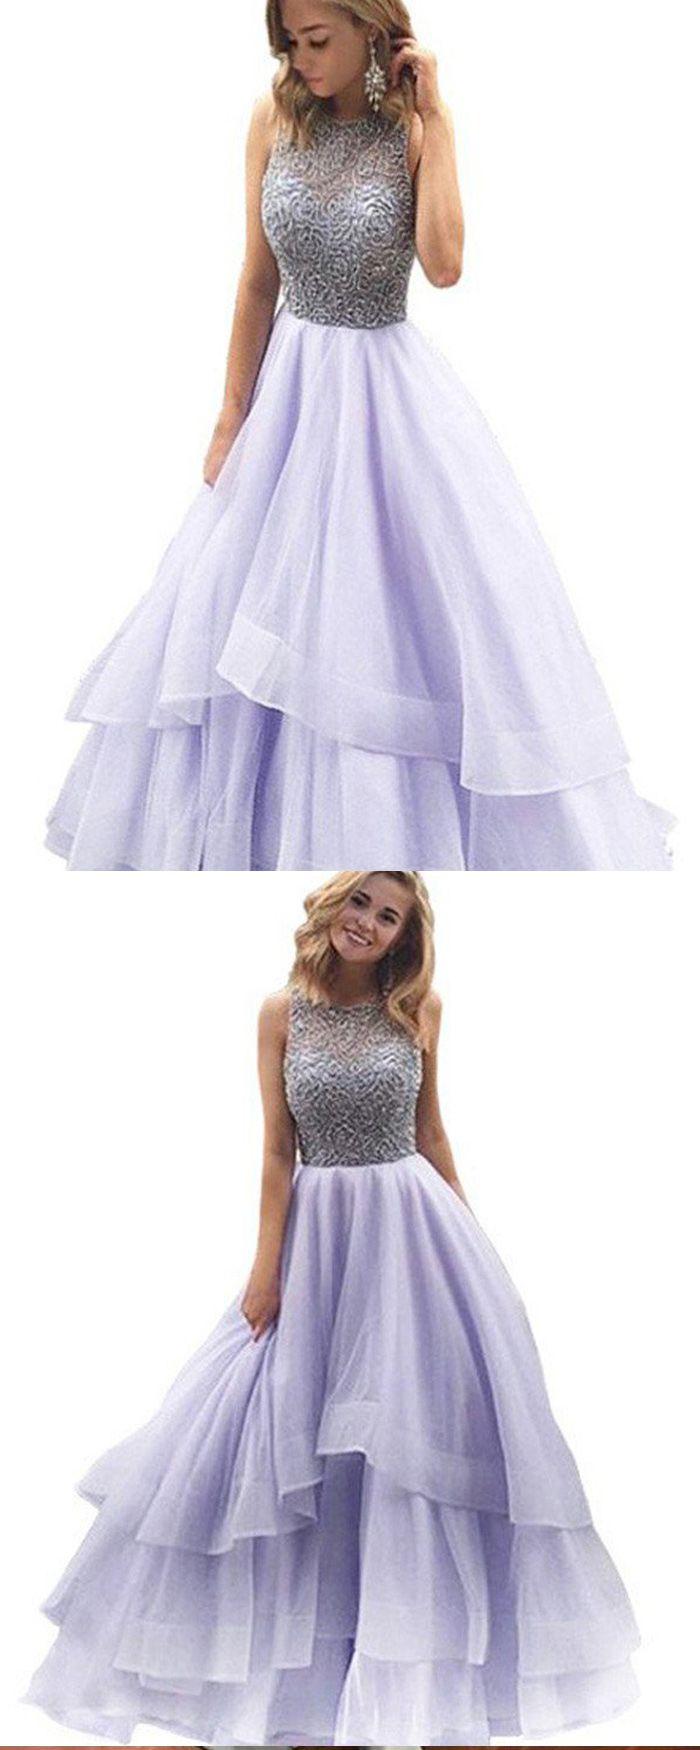 Jewel beading bodice lavender long prom dress with layered skirt